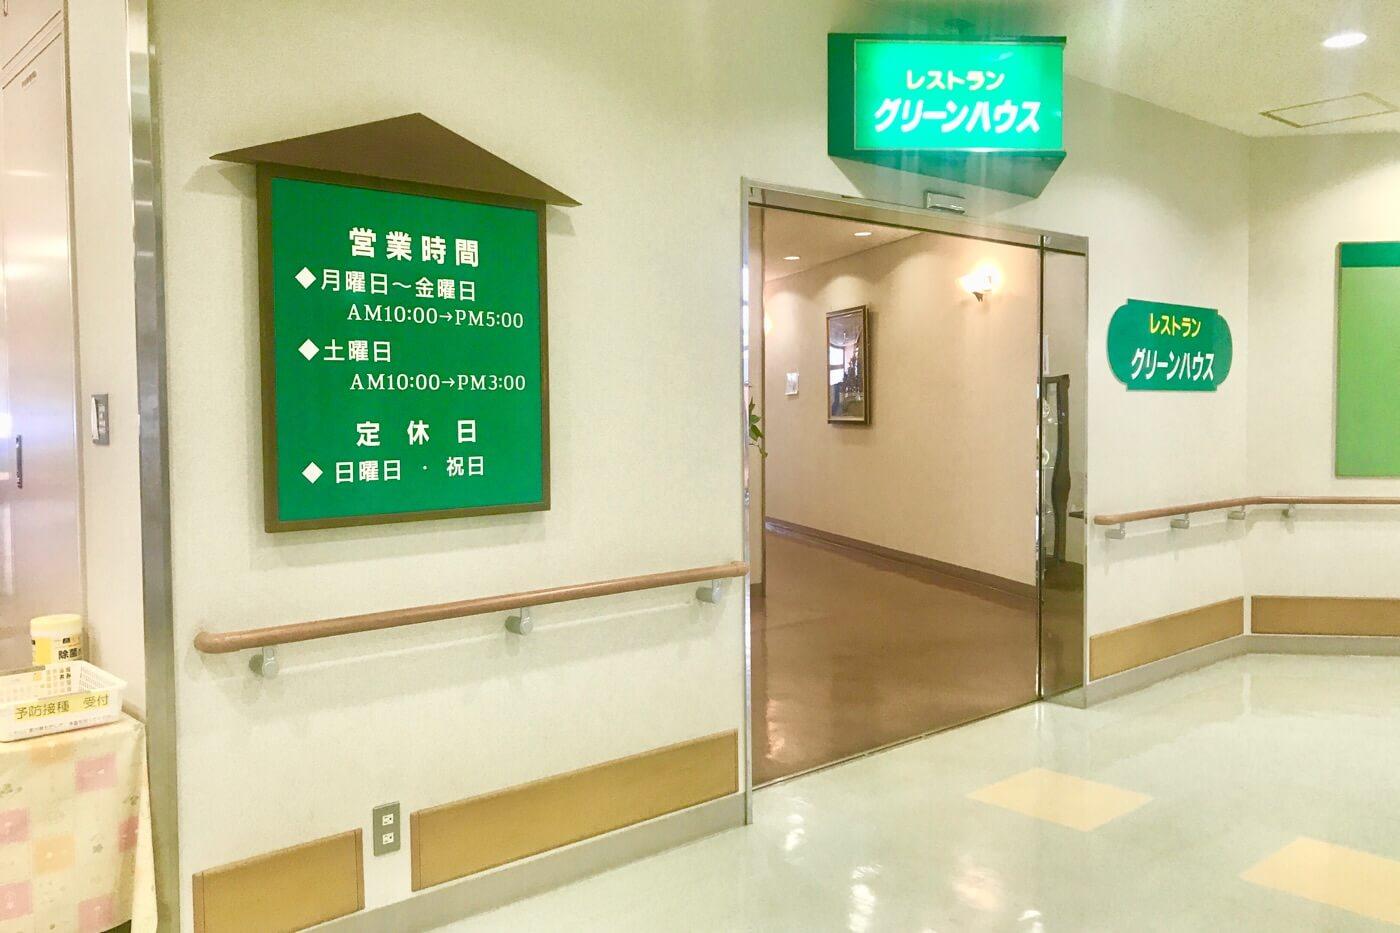 JA高知病院内のレストラン グリーンハウスの外観